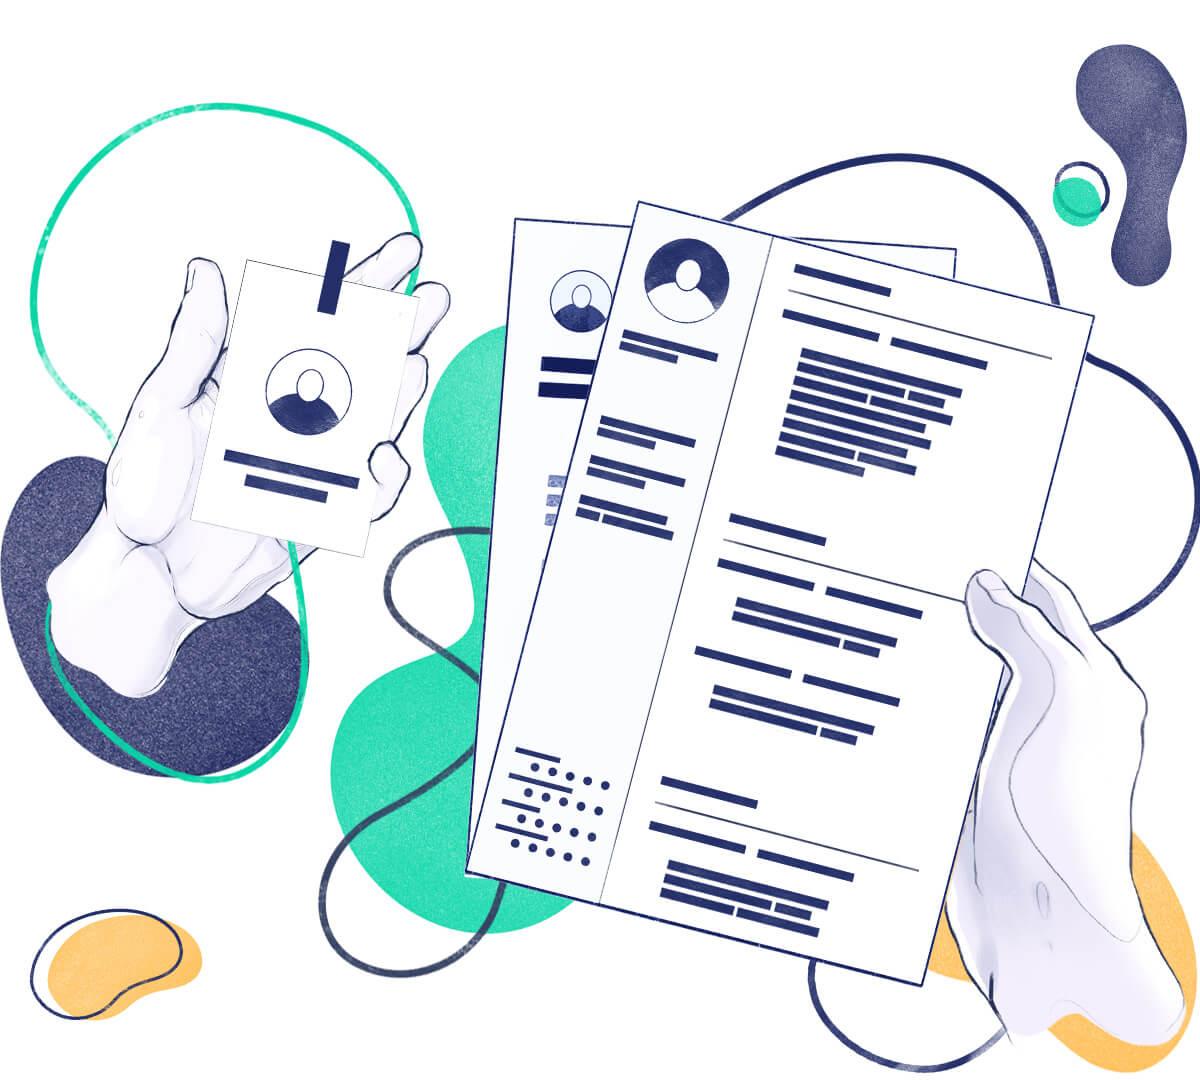 Internship CV Examples—Template & 25+ Writing Tips